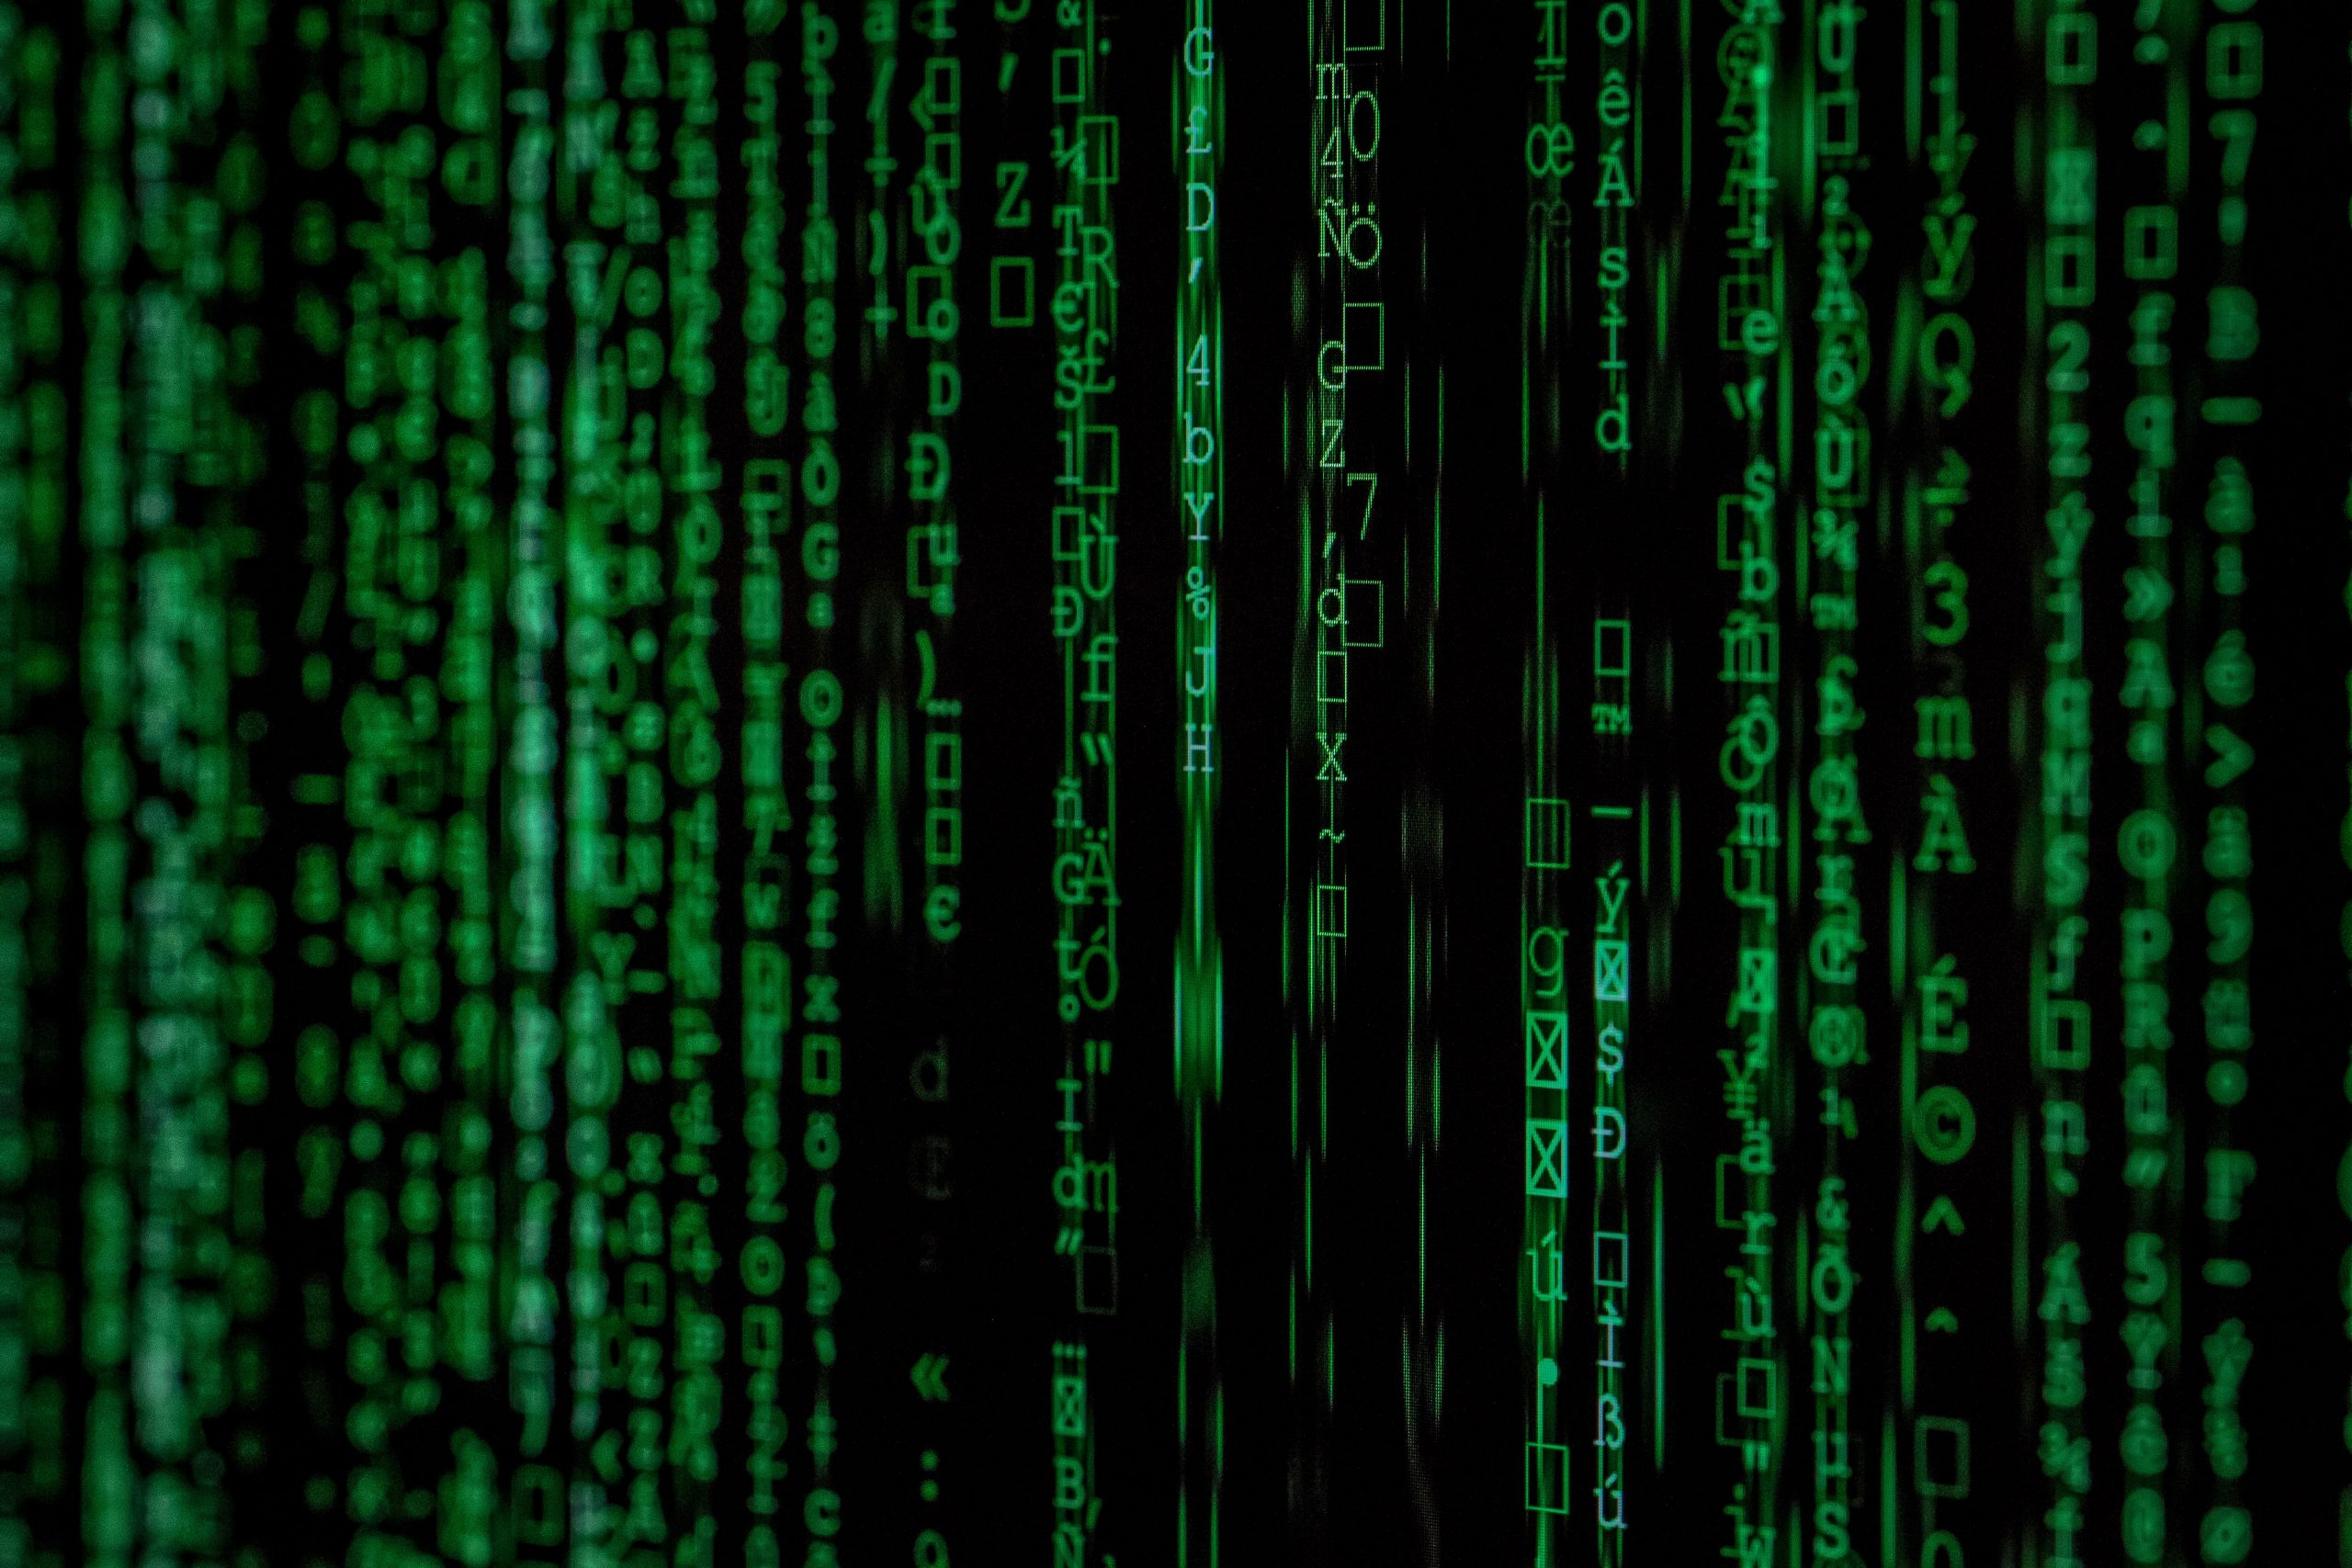 australian cyber attacks: who's at risk?